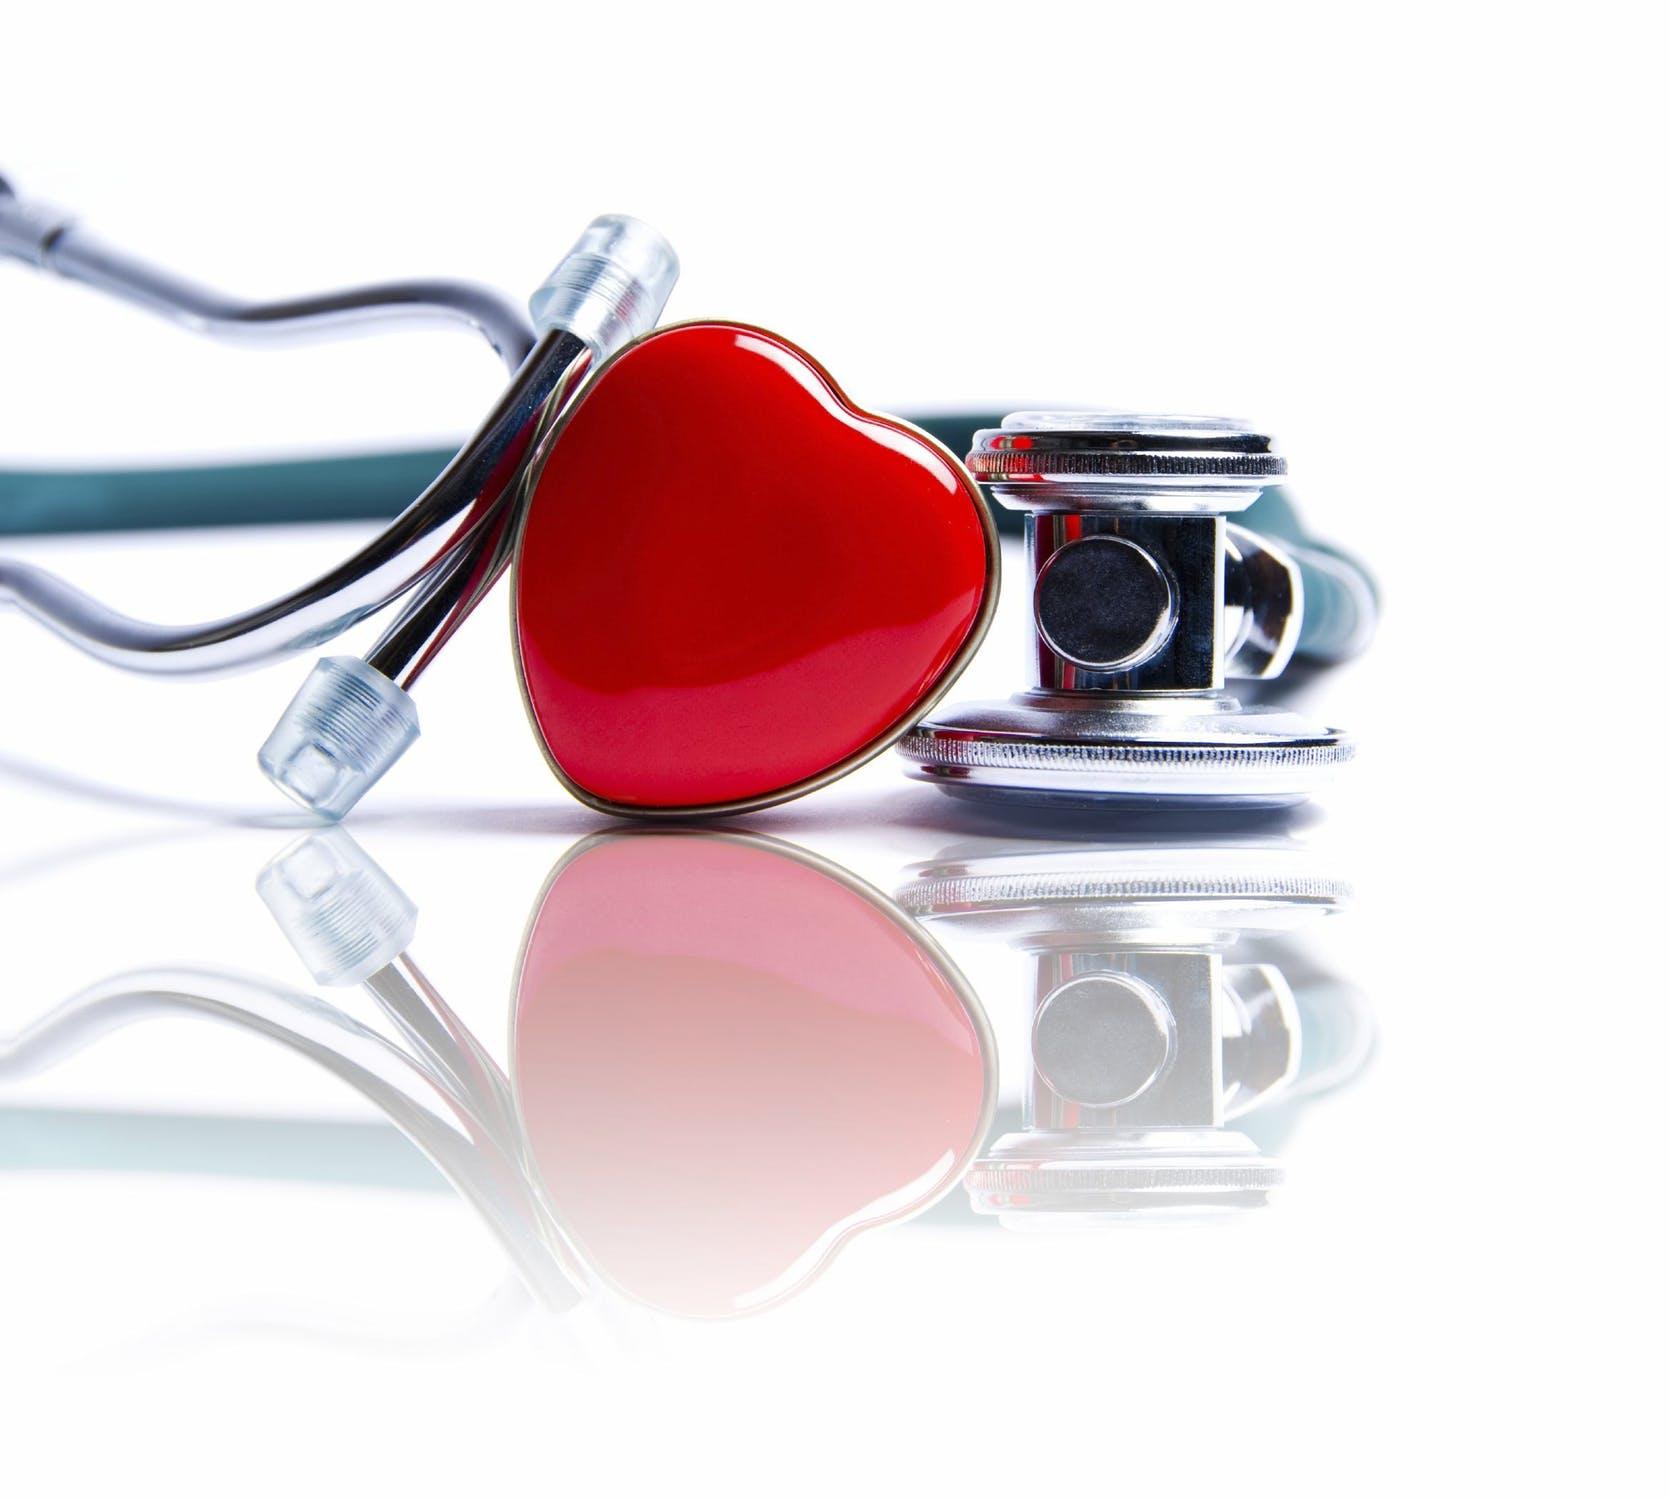 Gastroenterologist Los Angeles, Dr  Peyton Berrokim, Offers